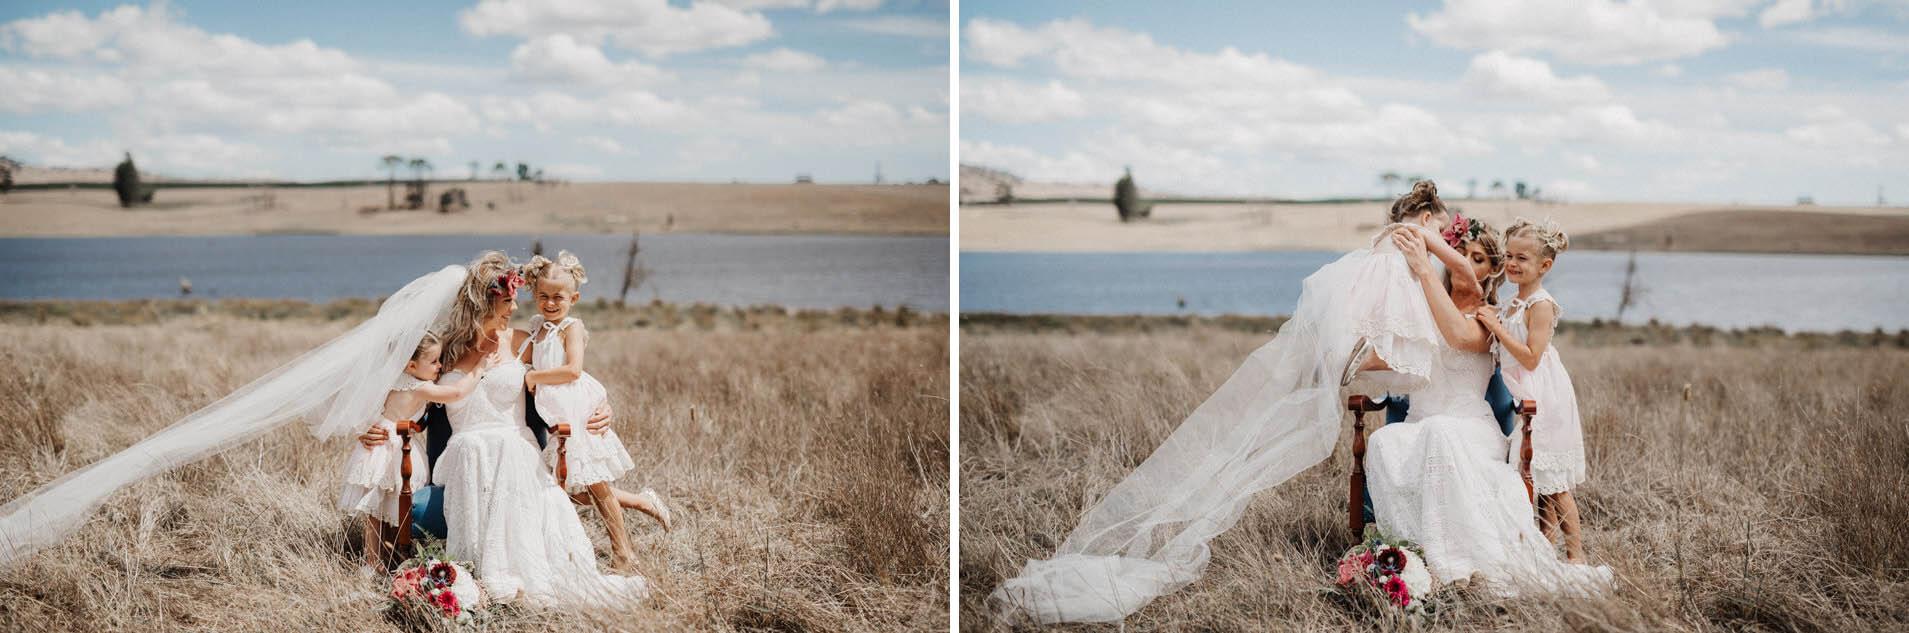 suger-pine-walk-wedding (Corinna & Dylan)_037(0584)2.jpg